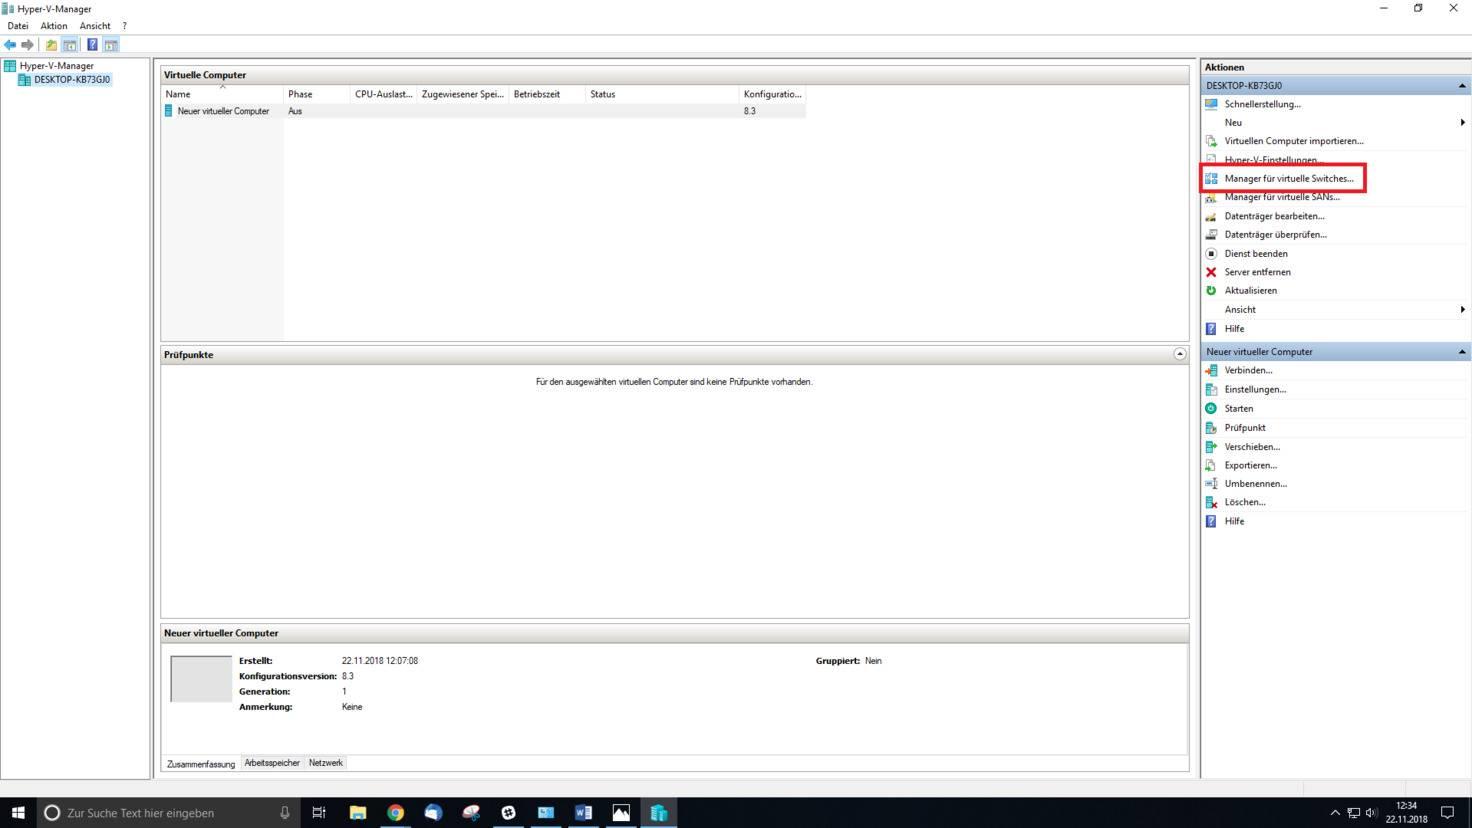 hyper-v-manager-screenshot-01